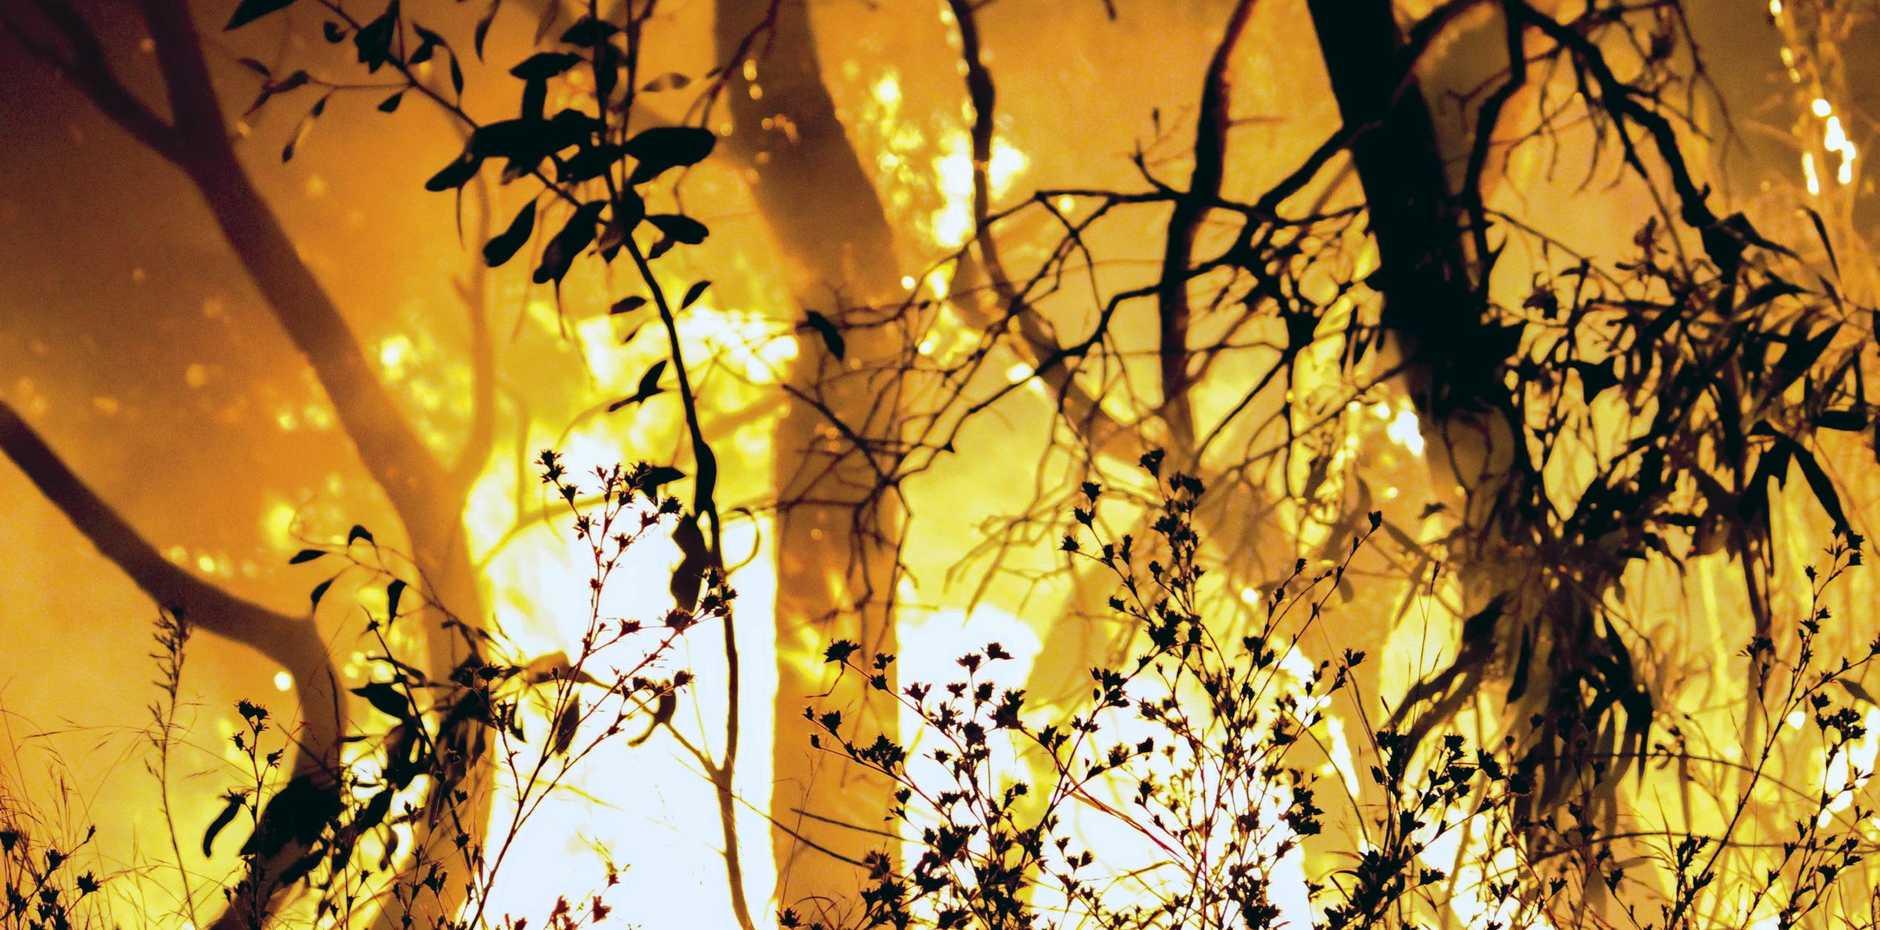 DANGER ESCALATES: 'Severe' fire danger is forecast.